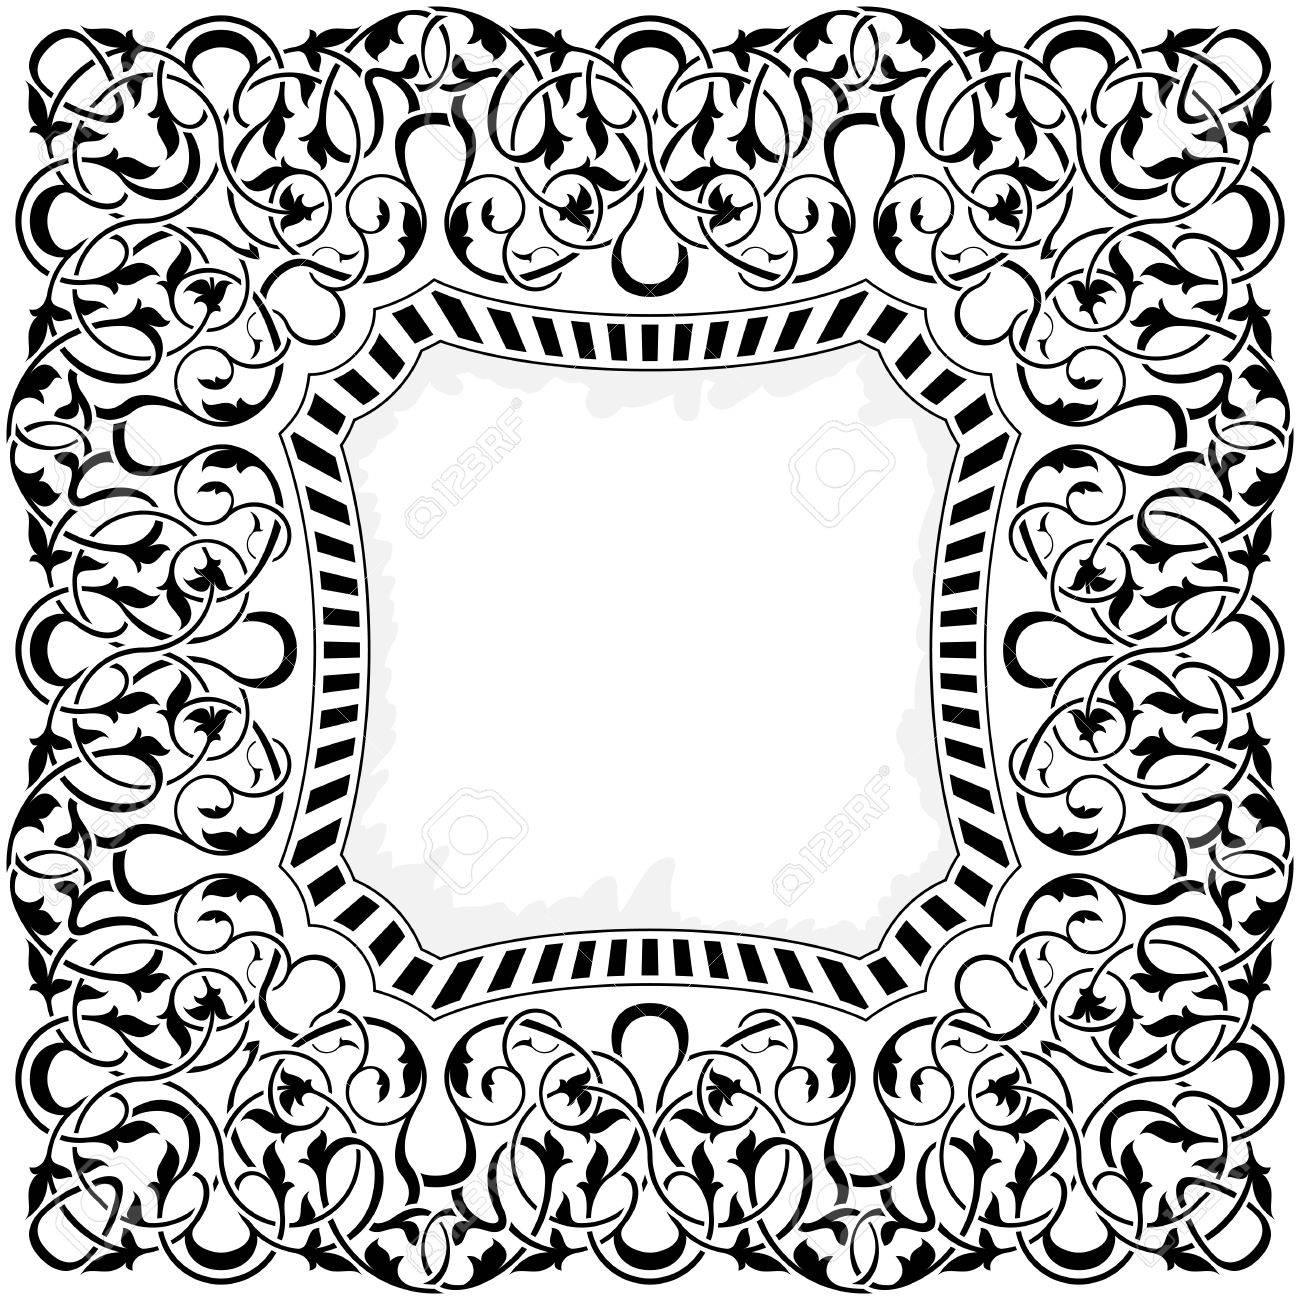 Black frame with ornamental border Stock Vector - 11097626